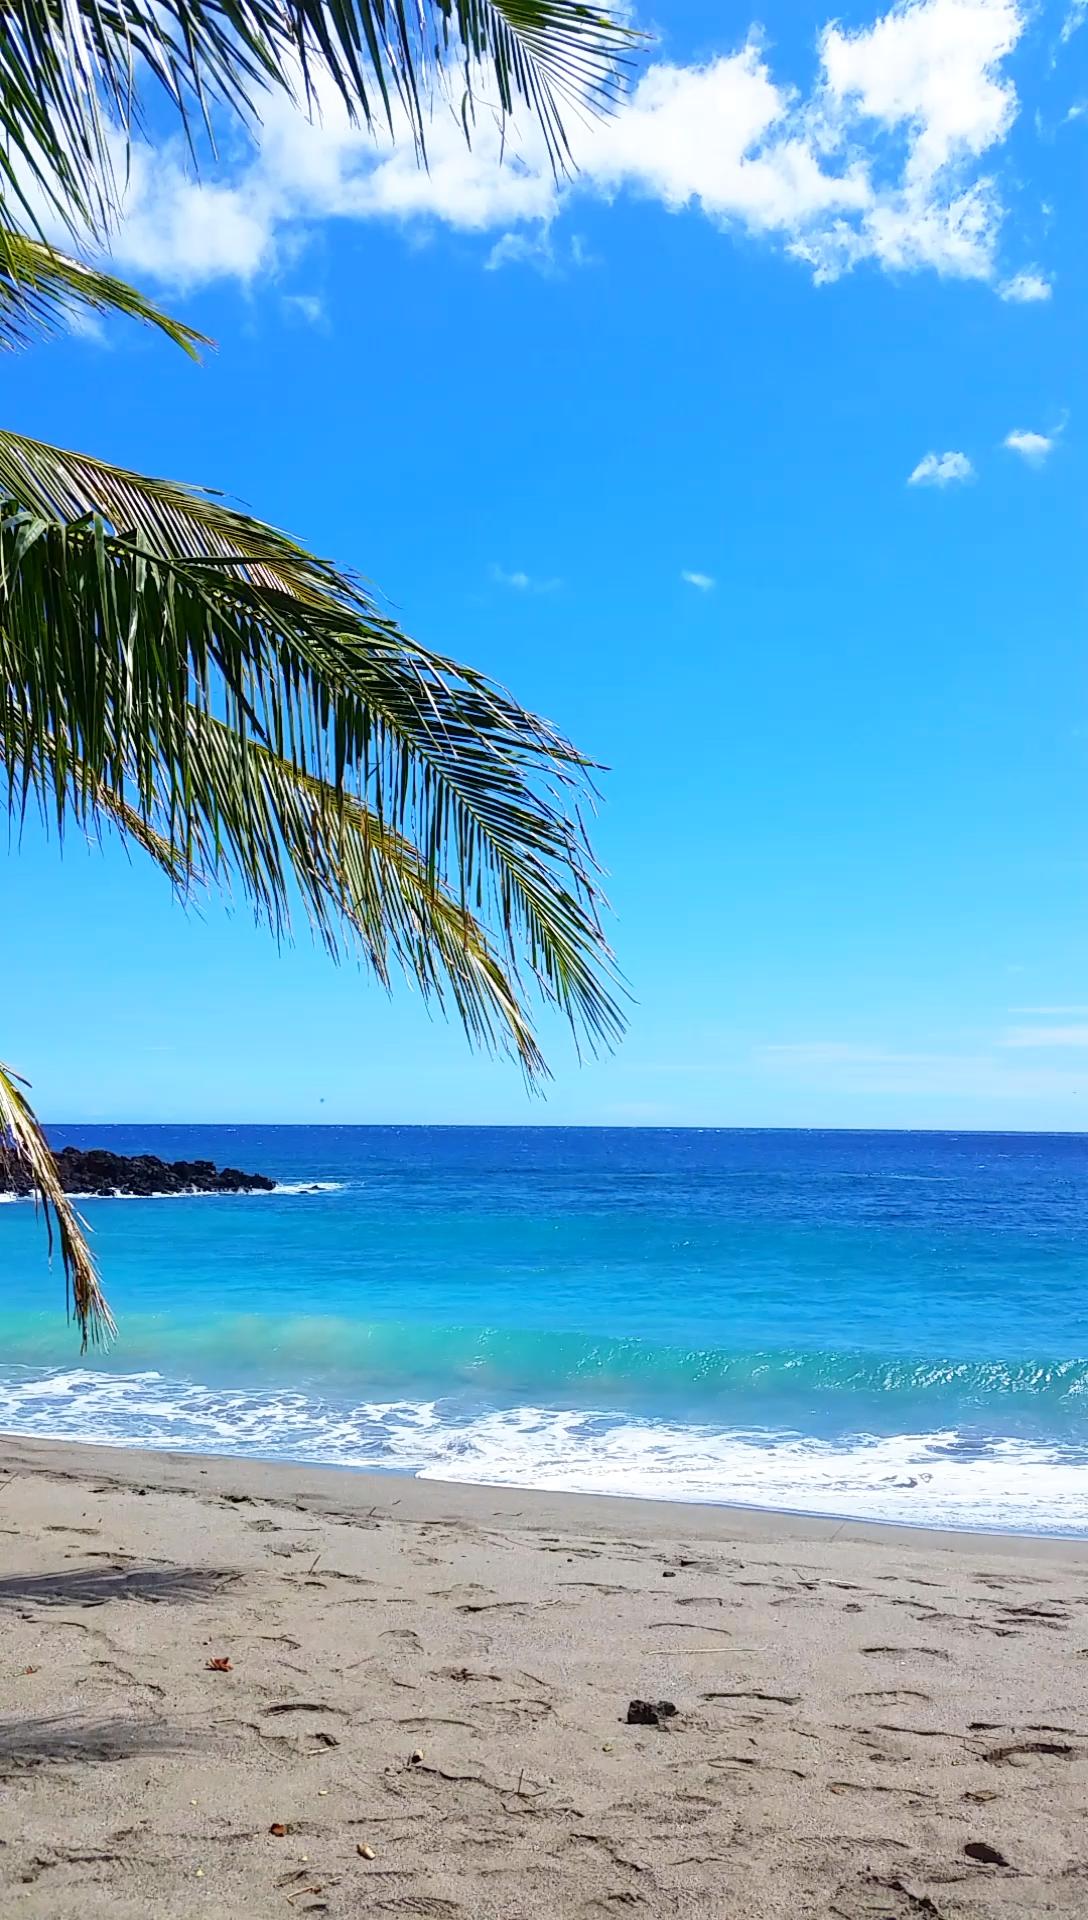 Travel Hawaii travel ideas. pohue bay beach hike. Outdoor beach travel tips. beautiful places for world bucket list, wanderlust inspiration, tropical islands. #flashpackingamerica